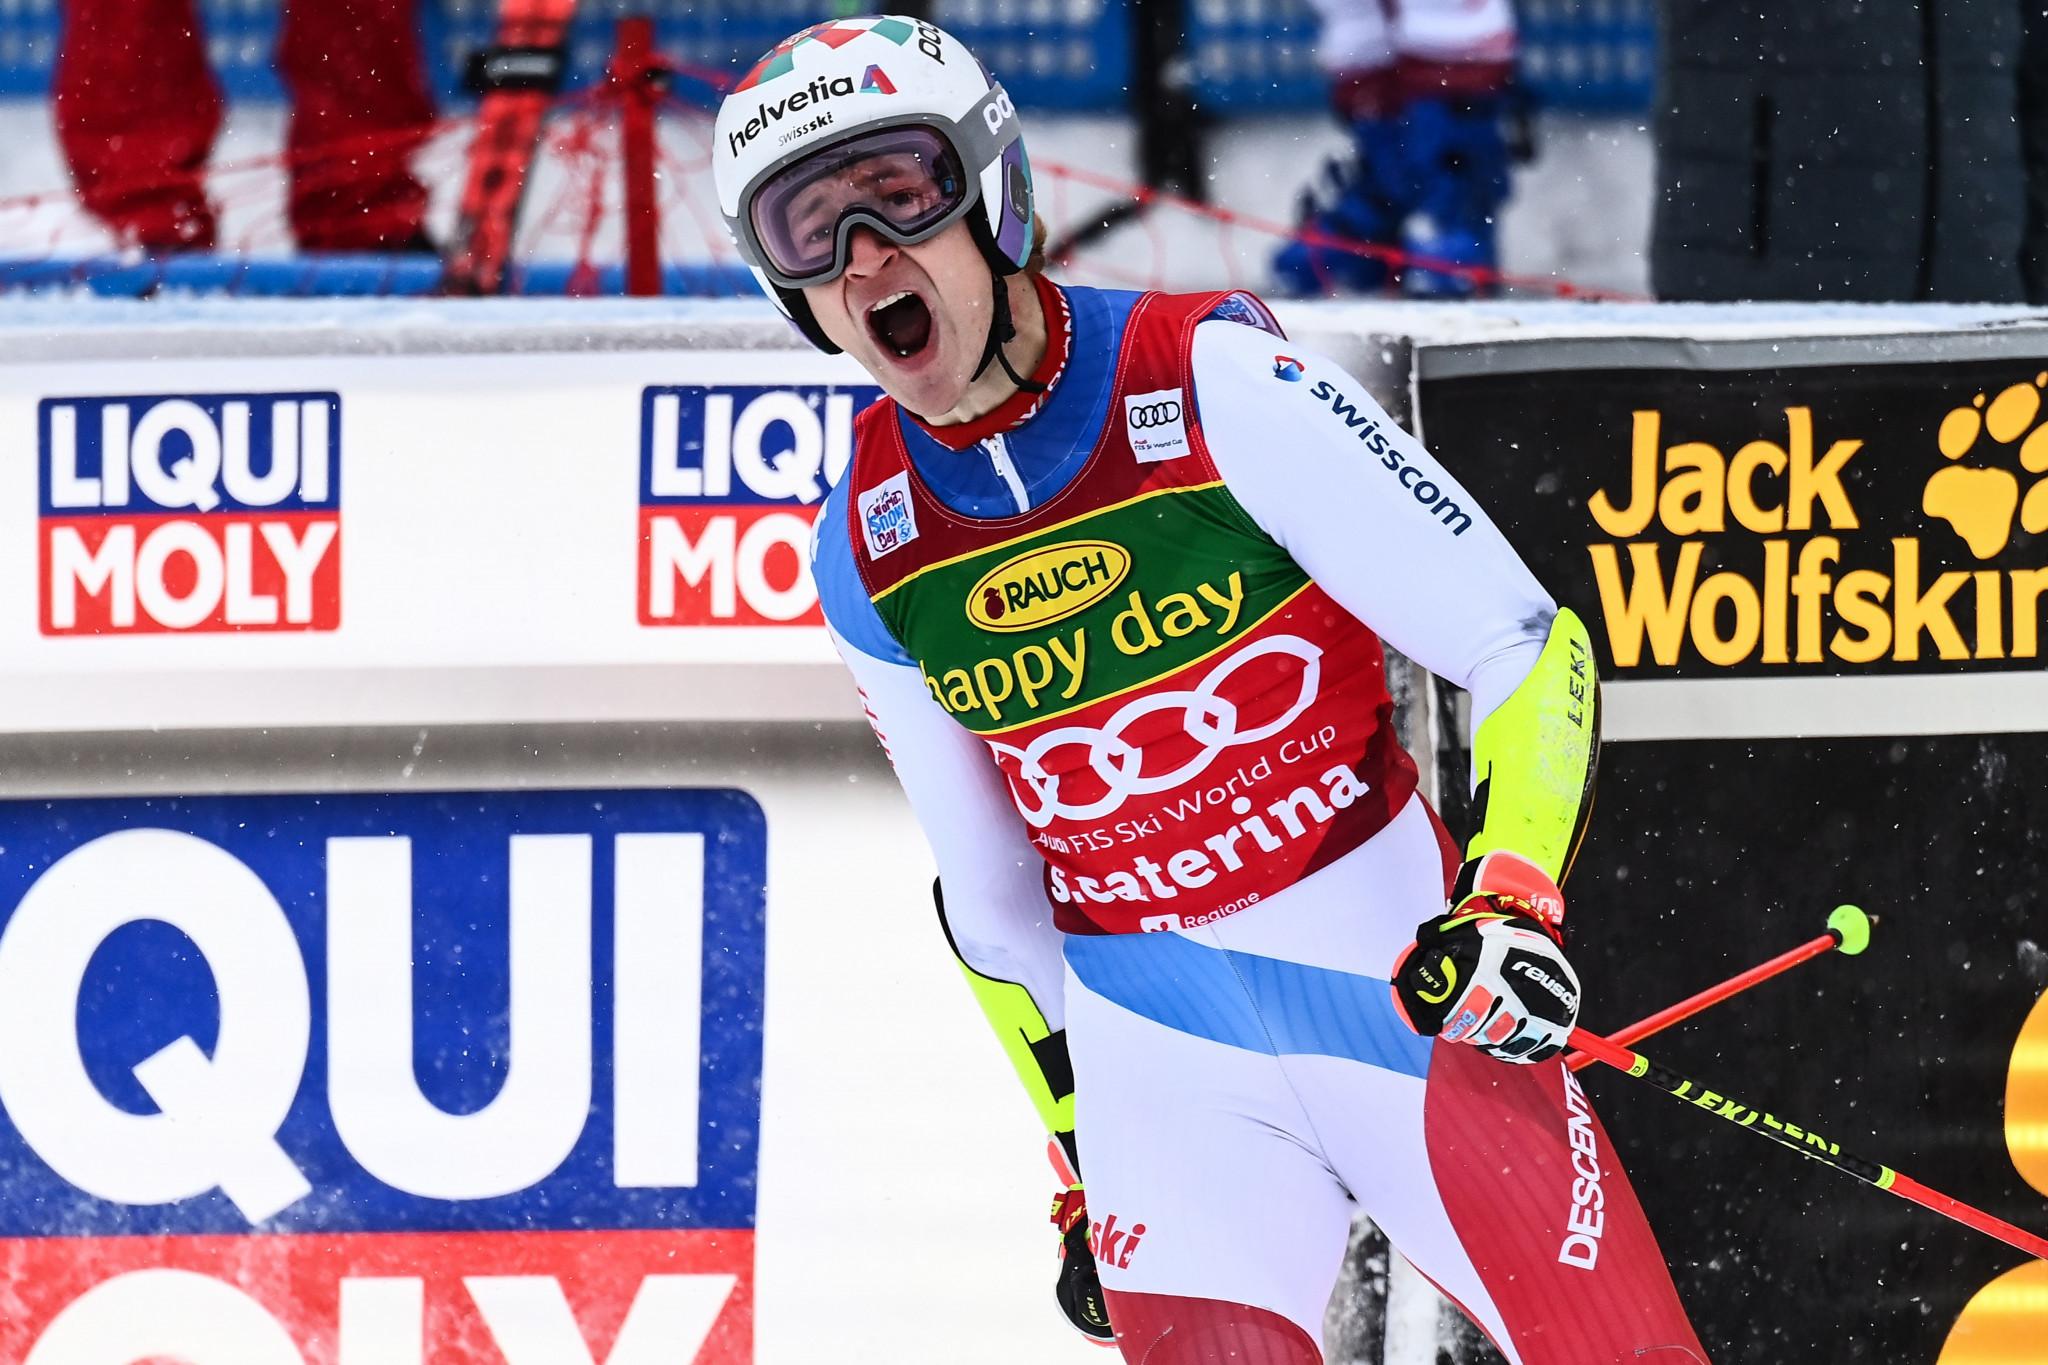 Odermatt wins first giant slalom World Cup win in delayed race in Santa Caterina